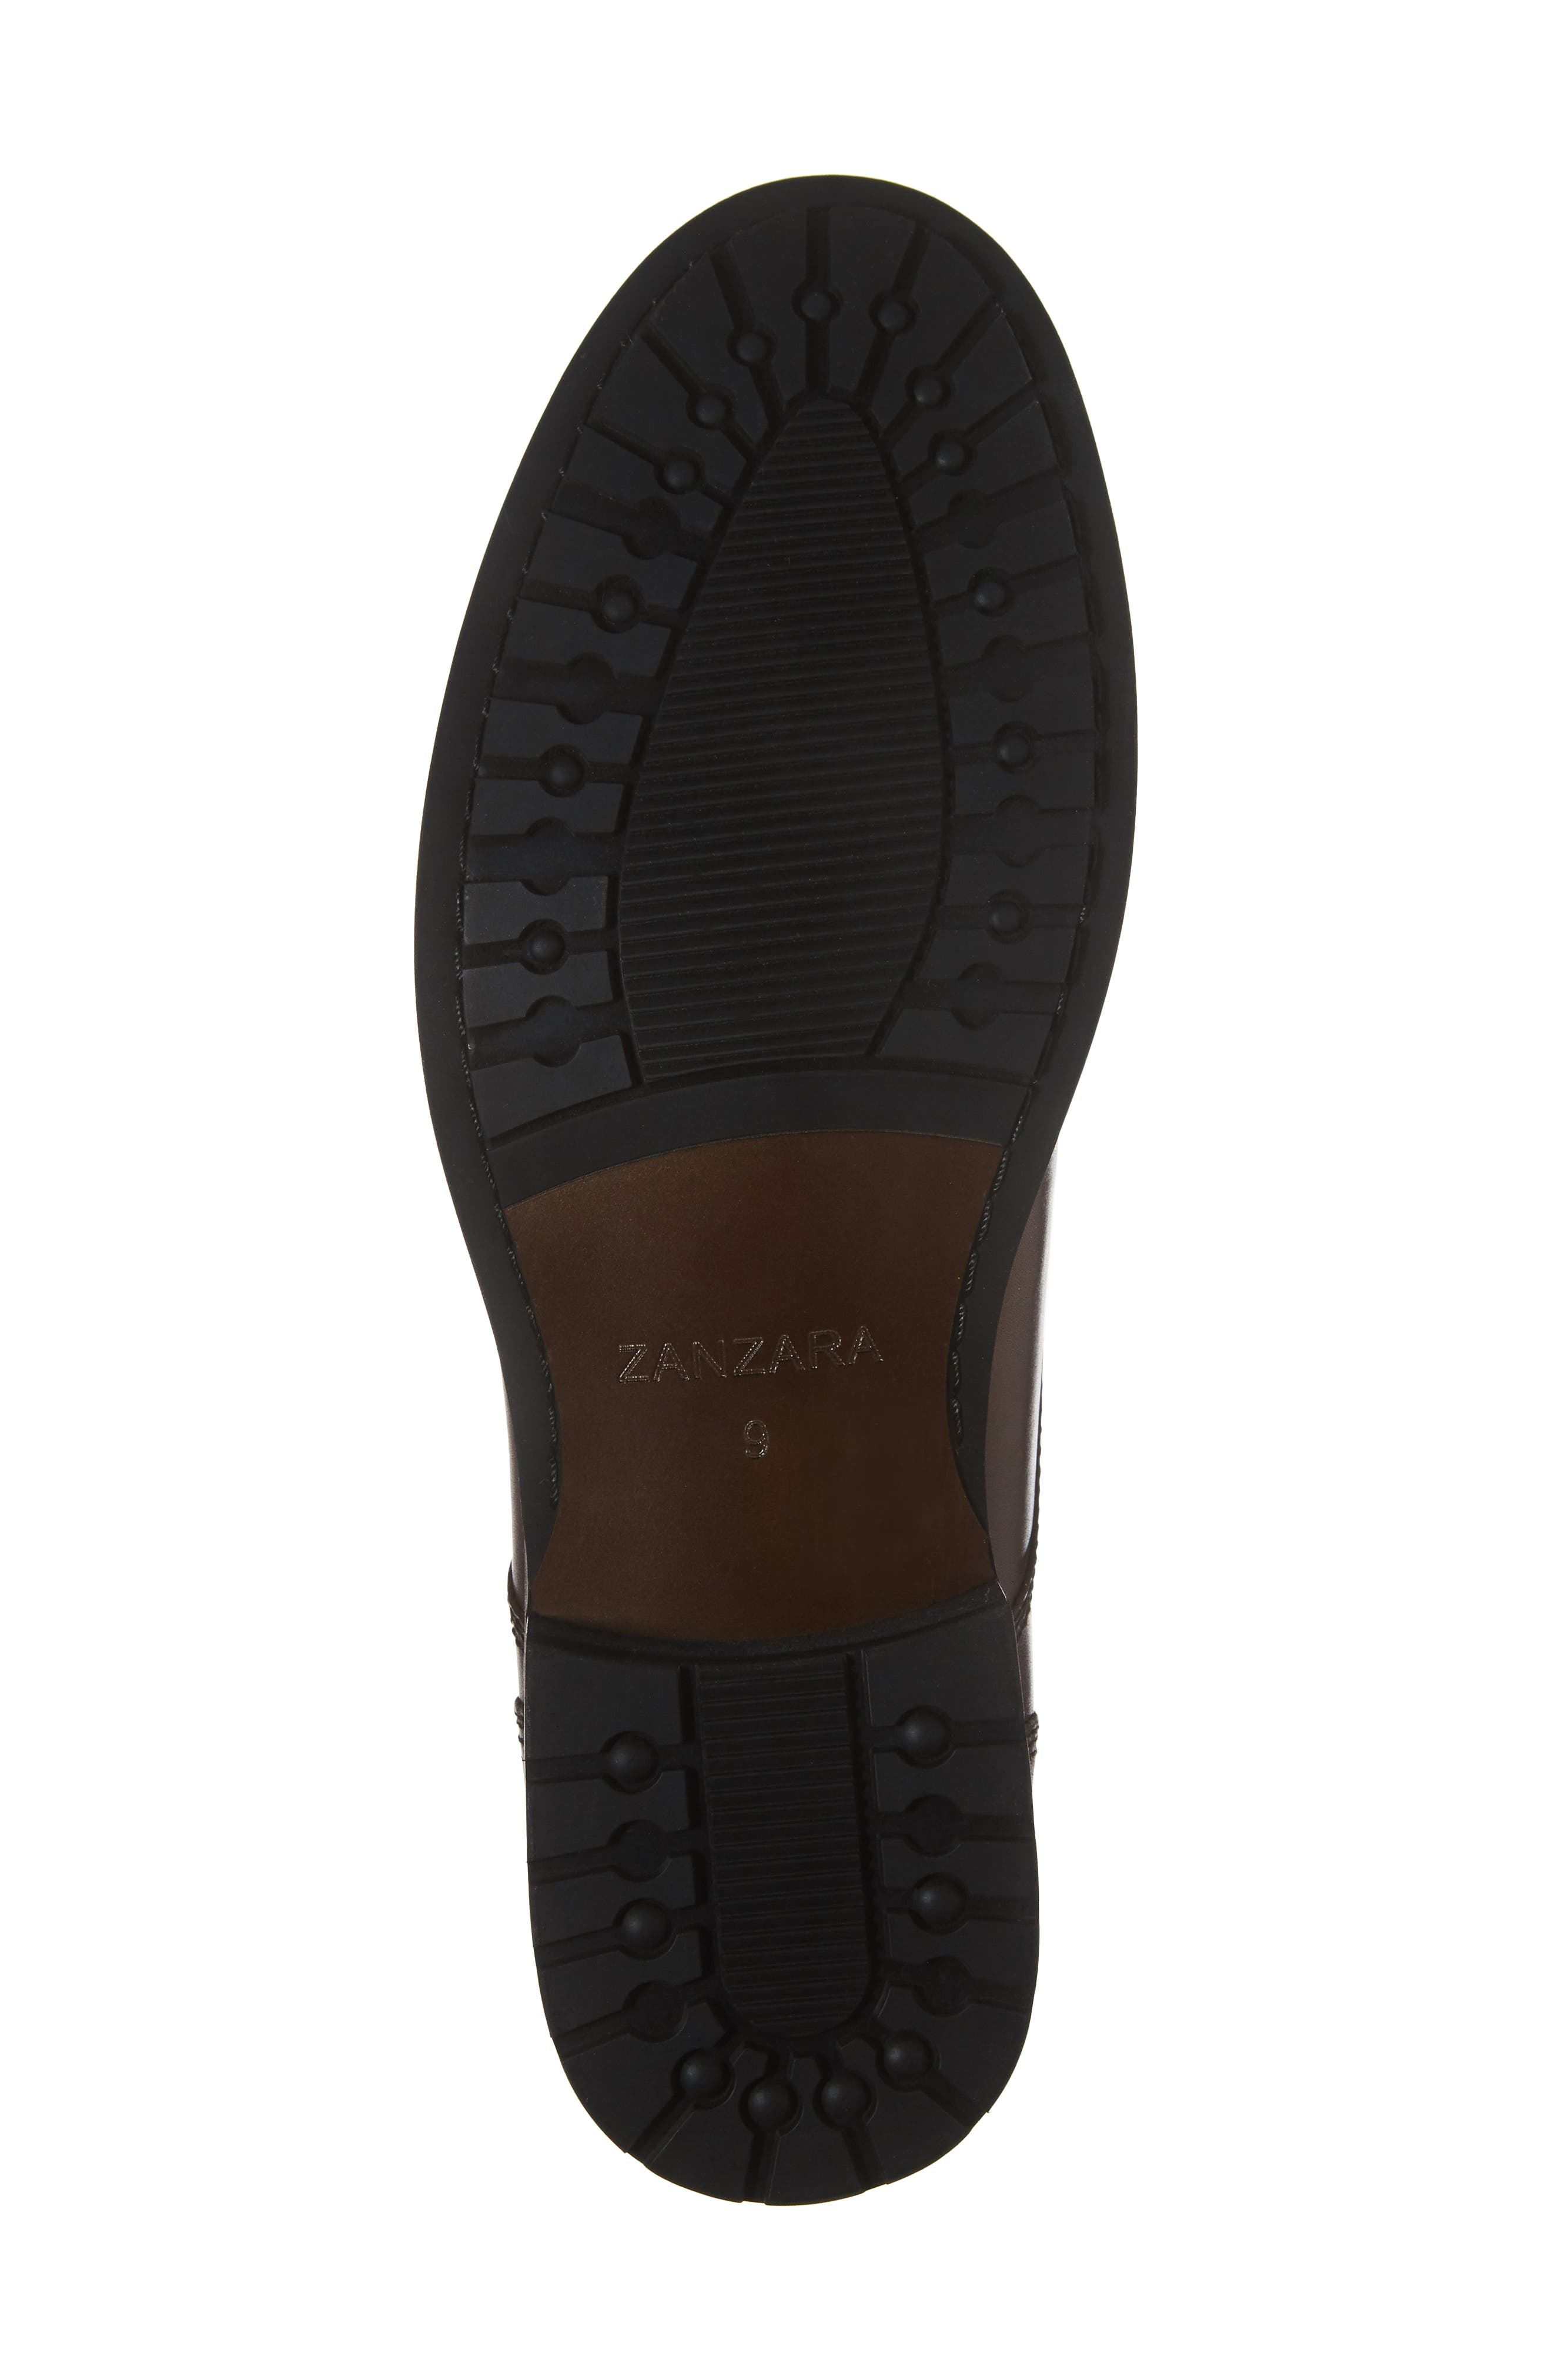 Saar Plain Toe Boot,                             Alternate thumbnail 6, color,                             Brown Leather